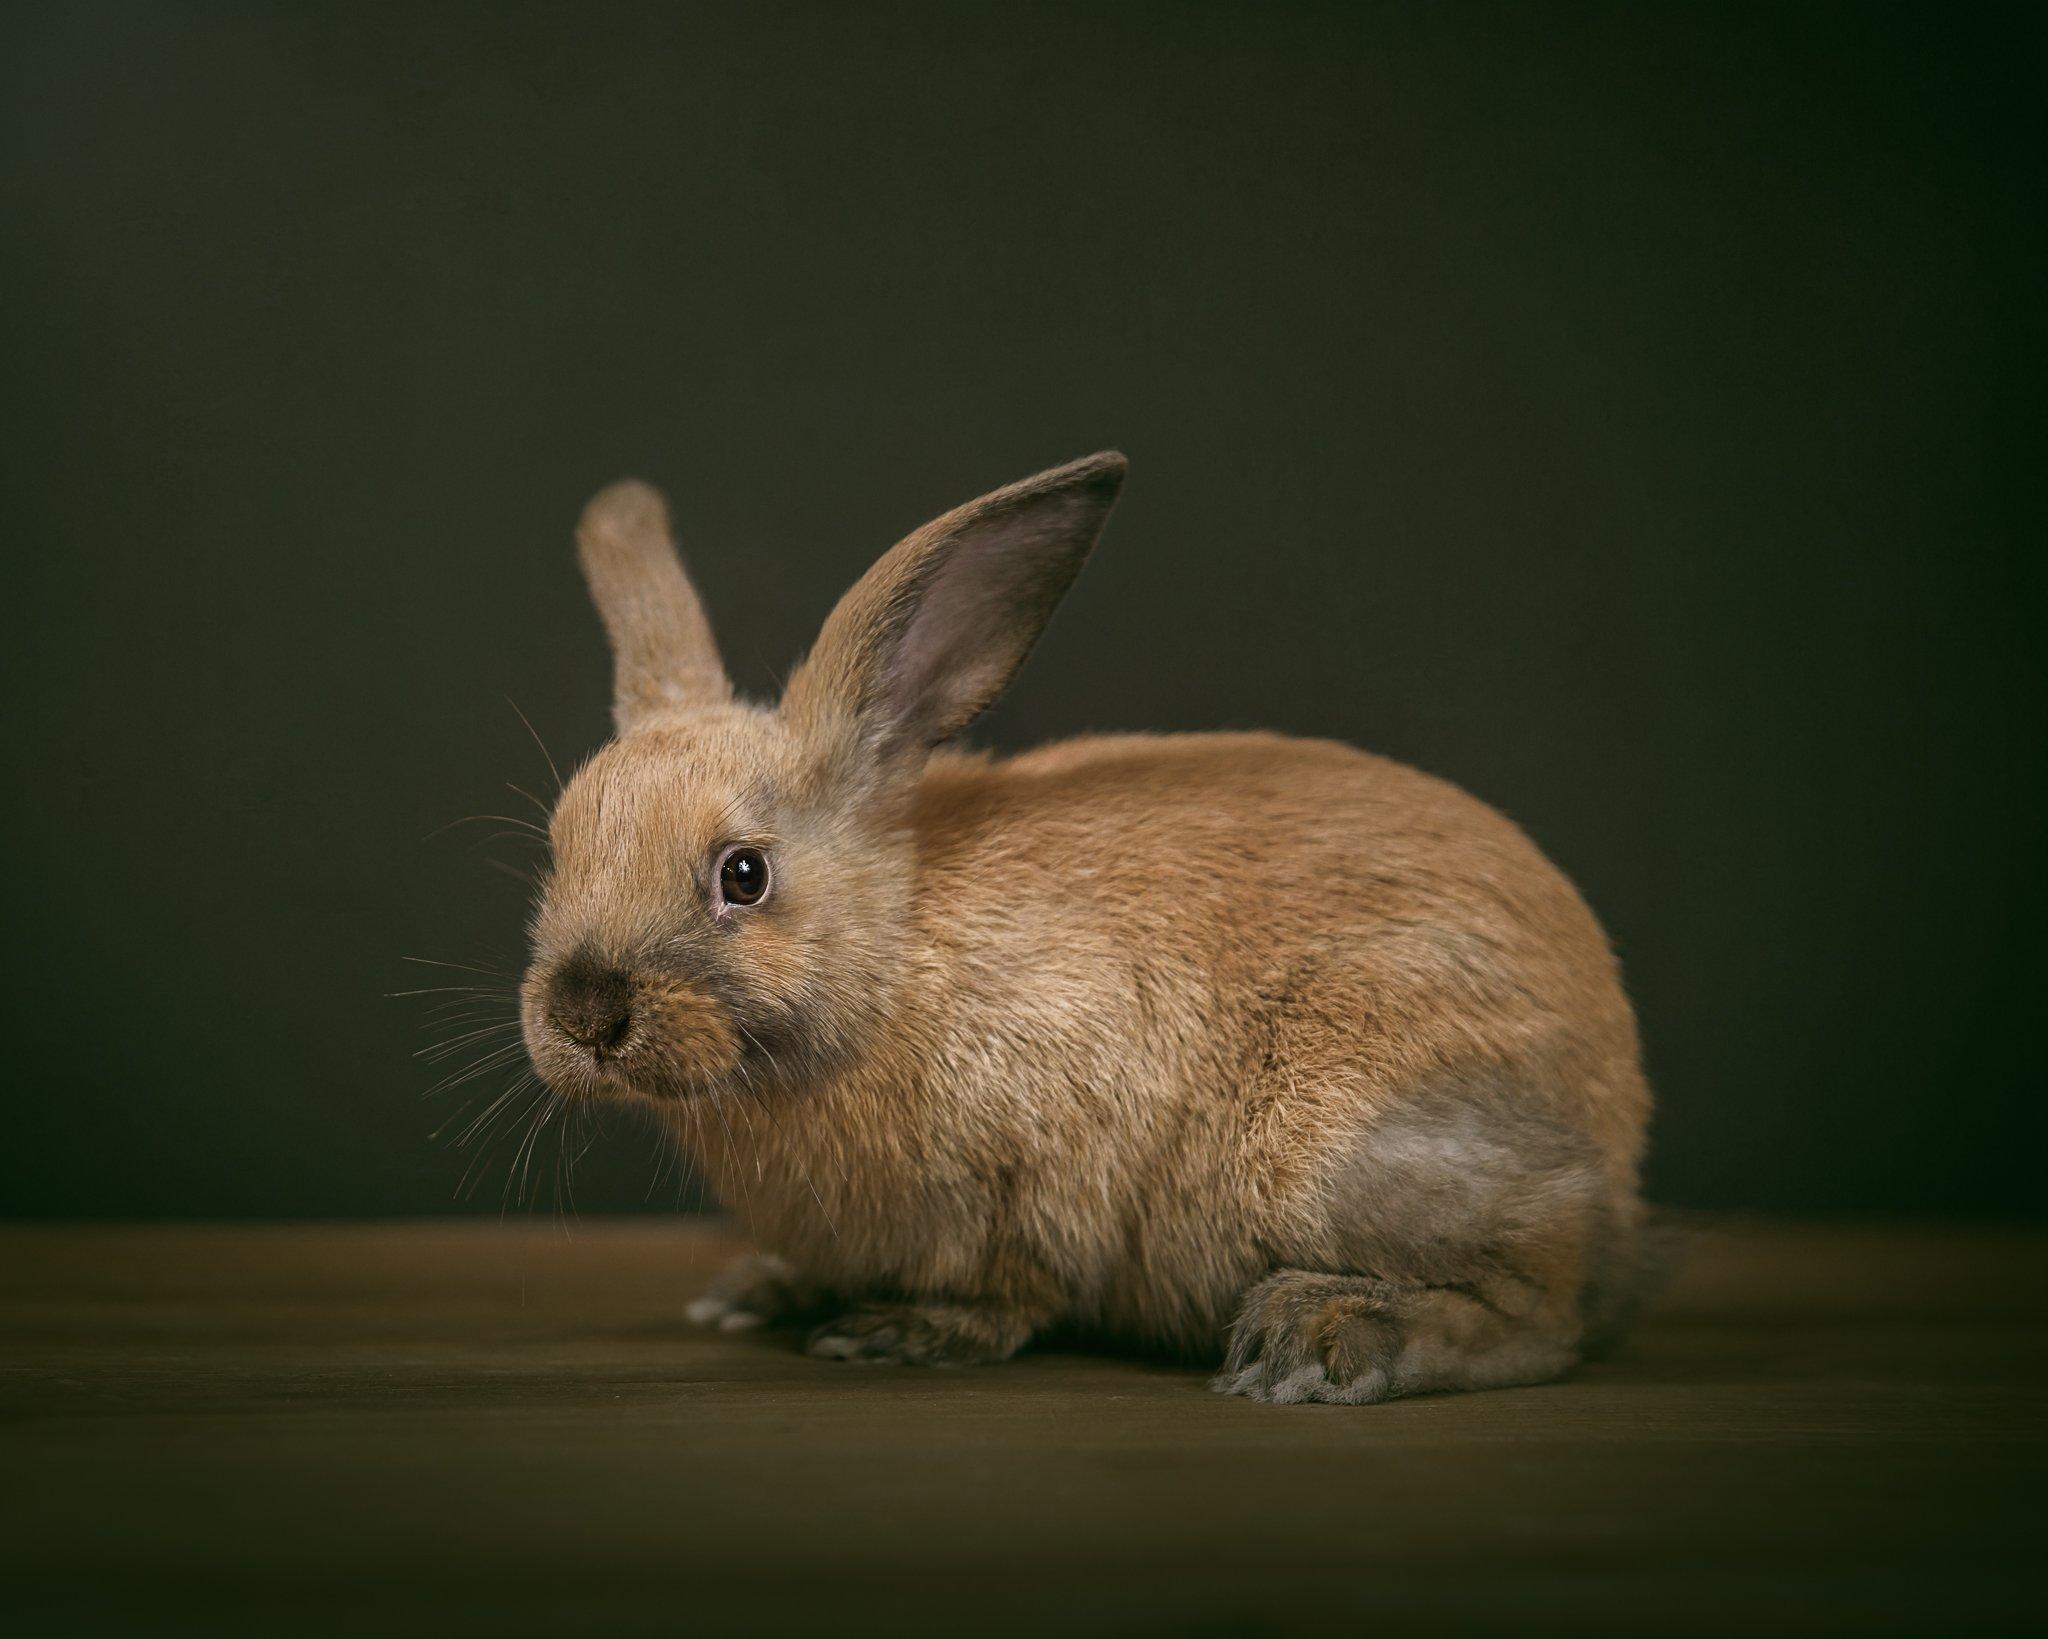 Alana Lee Photography: Bunny rabbit studio photo by Port Hope and Cobourg pet photographer Alana Lee